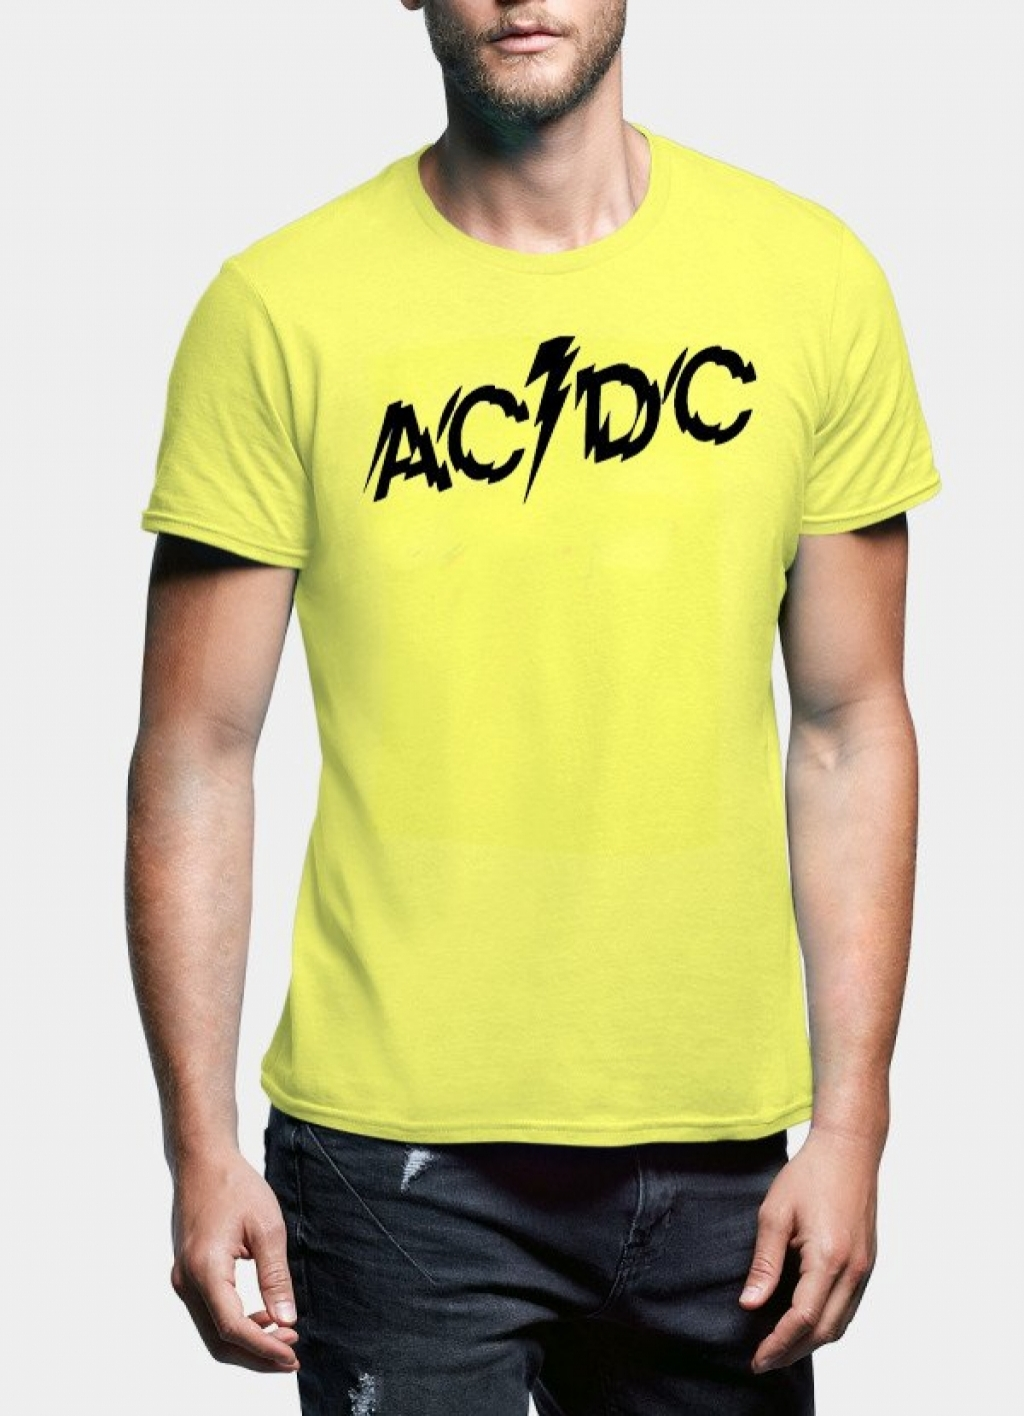 14964139500_ACDC_Back_In_Black_Half_Sleeve_Men_T-Shirt-yellow.jpg